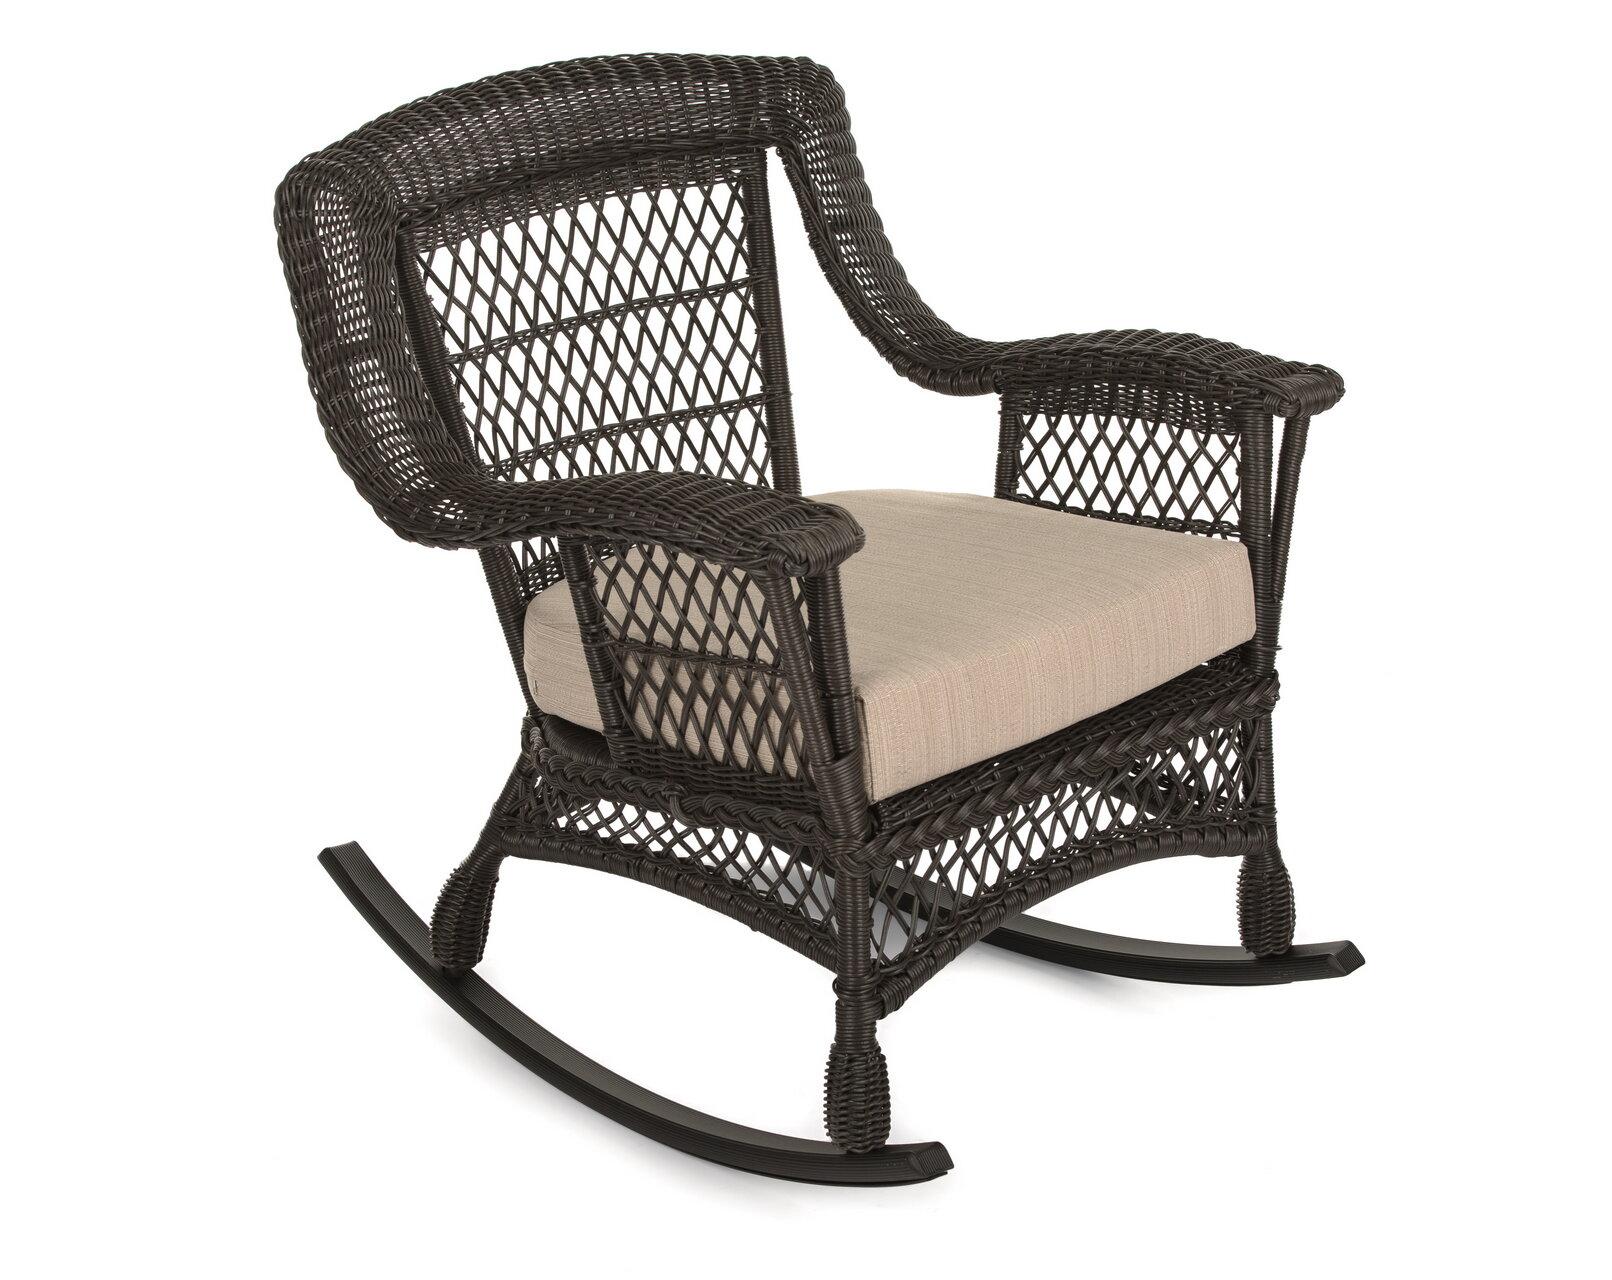 Wood Rocking Chair Porch Rocker Patio Deck Garden Backyard Furniture Walnut New